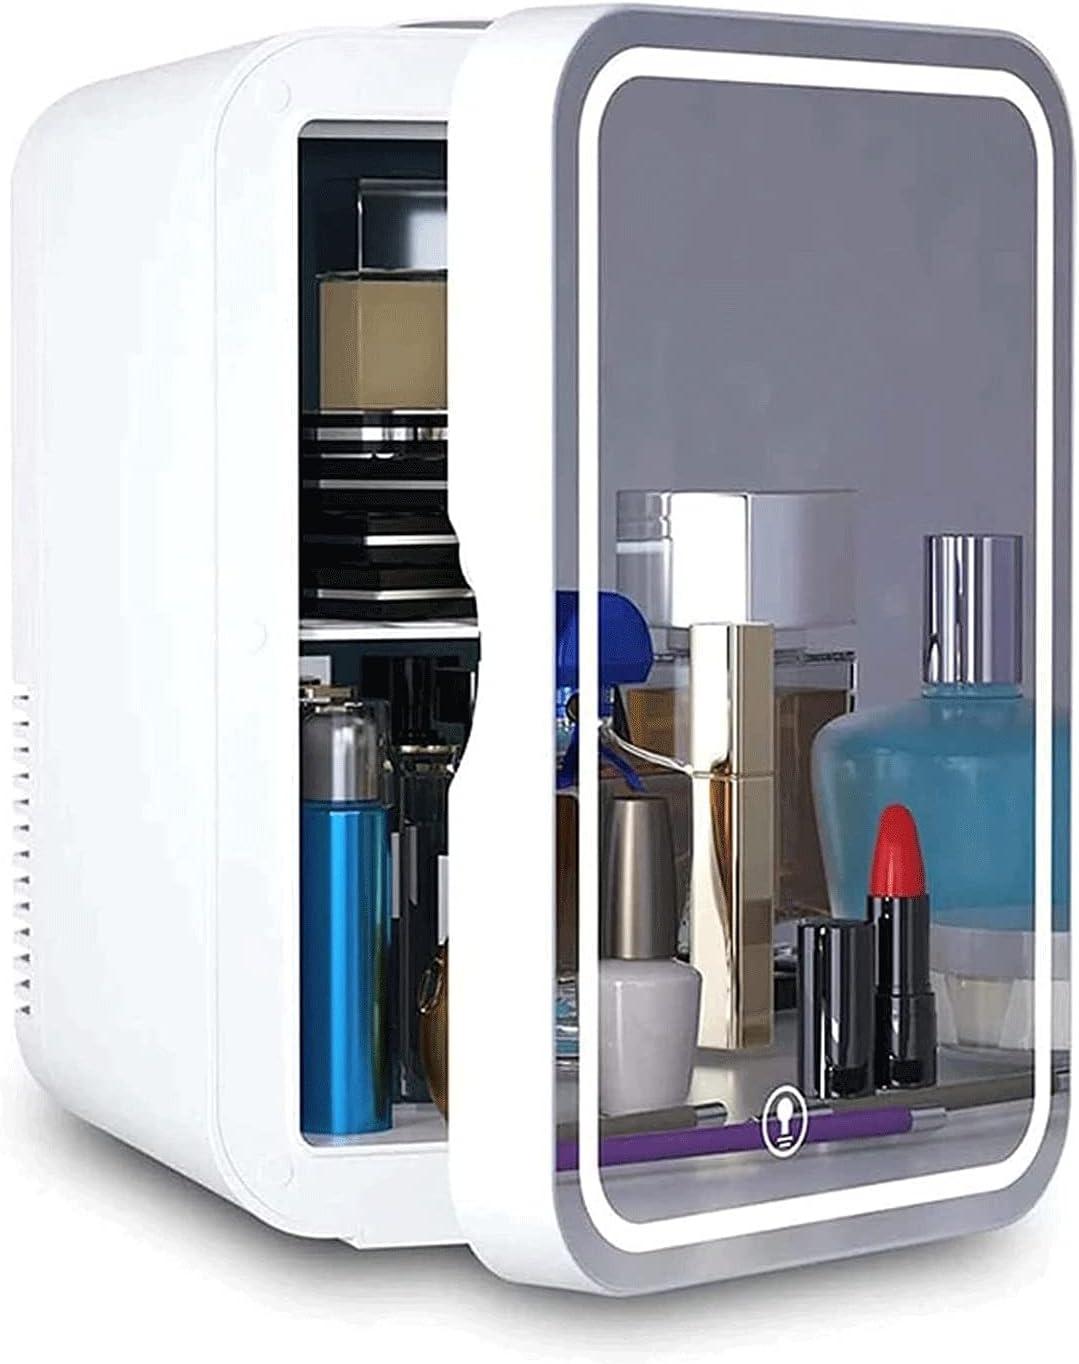 LJJSMG Mini Fridge 10 Liter AC Portable Thermoelectric Memphis Mall Cooler Max 58% OFF DC